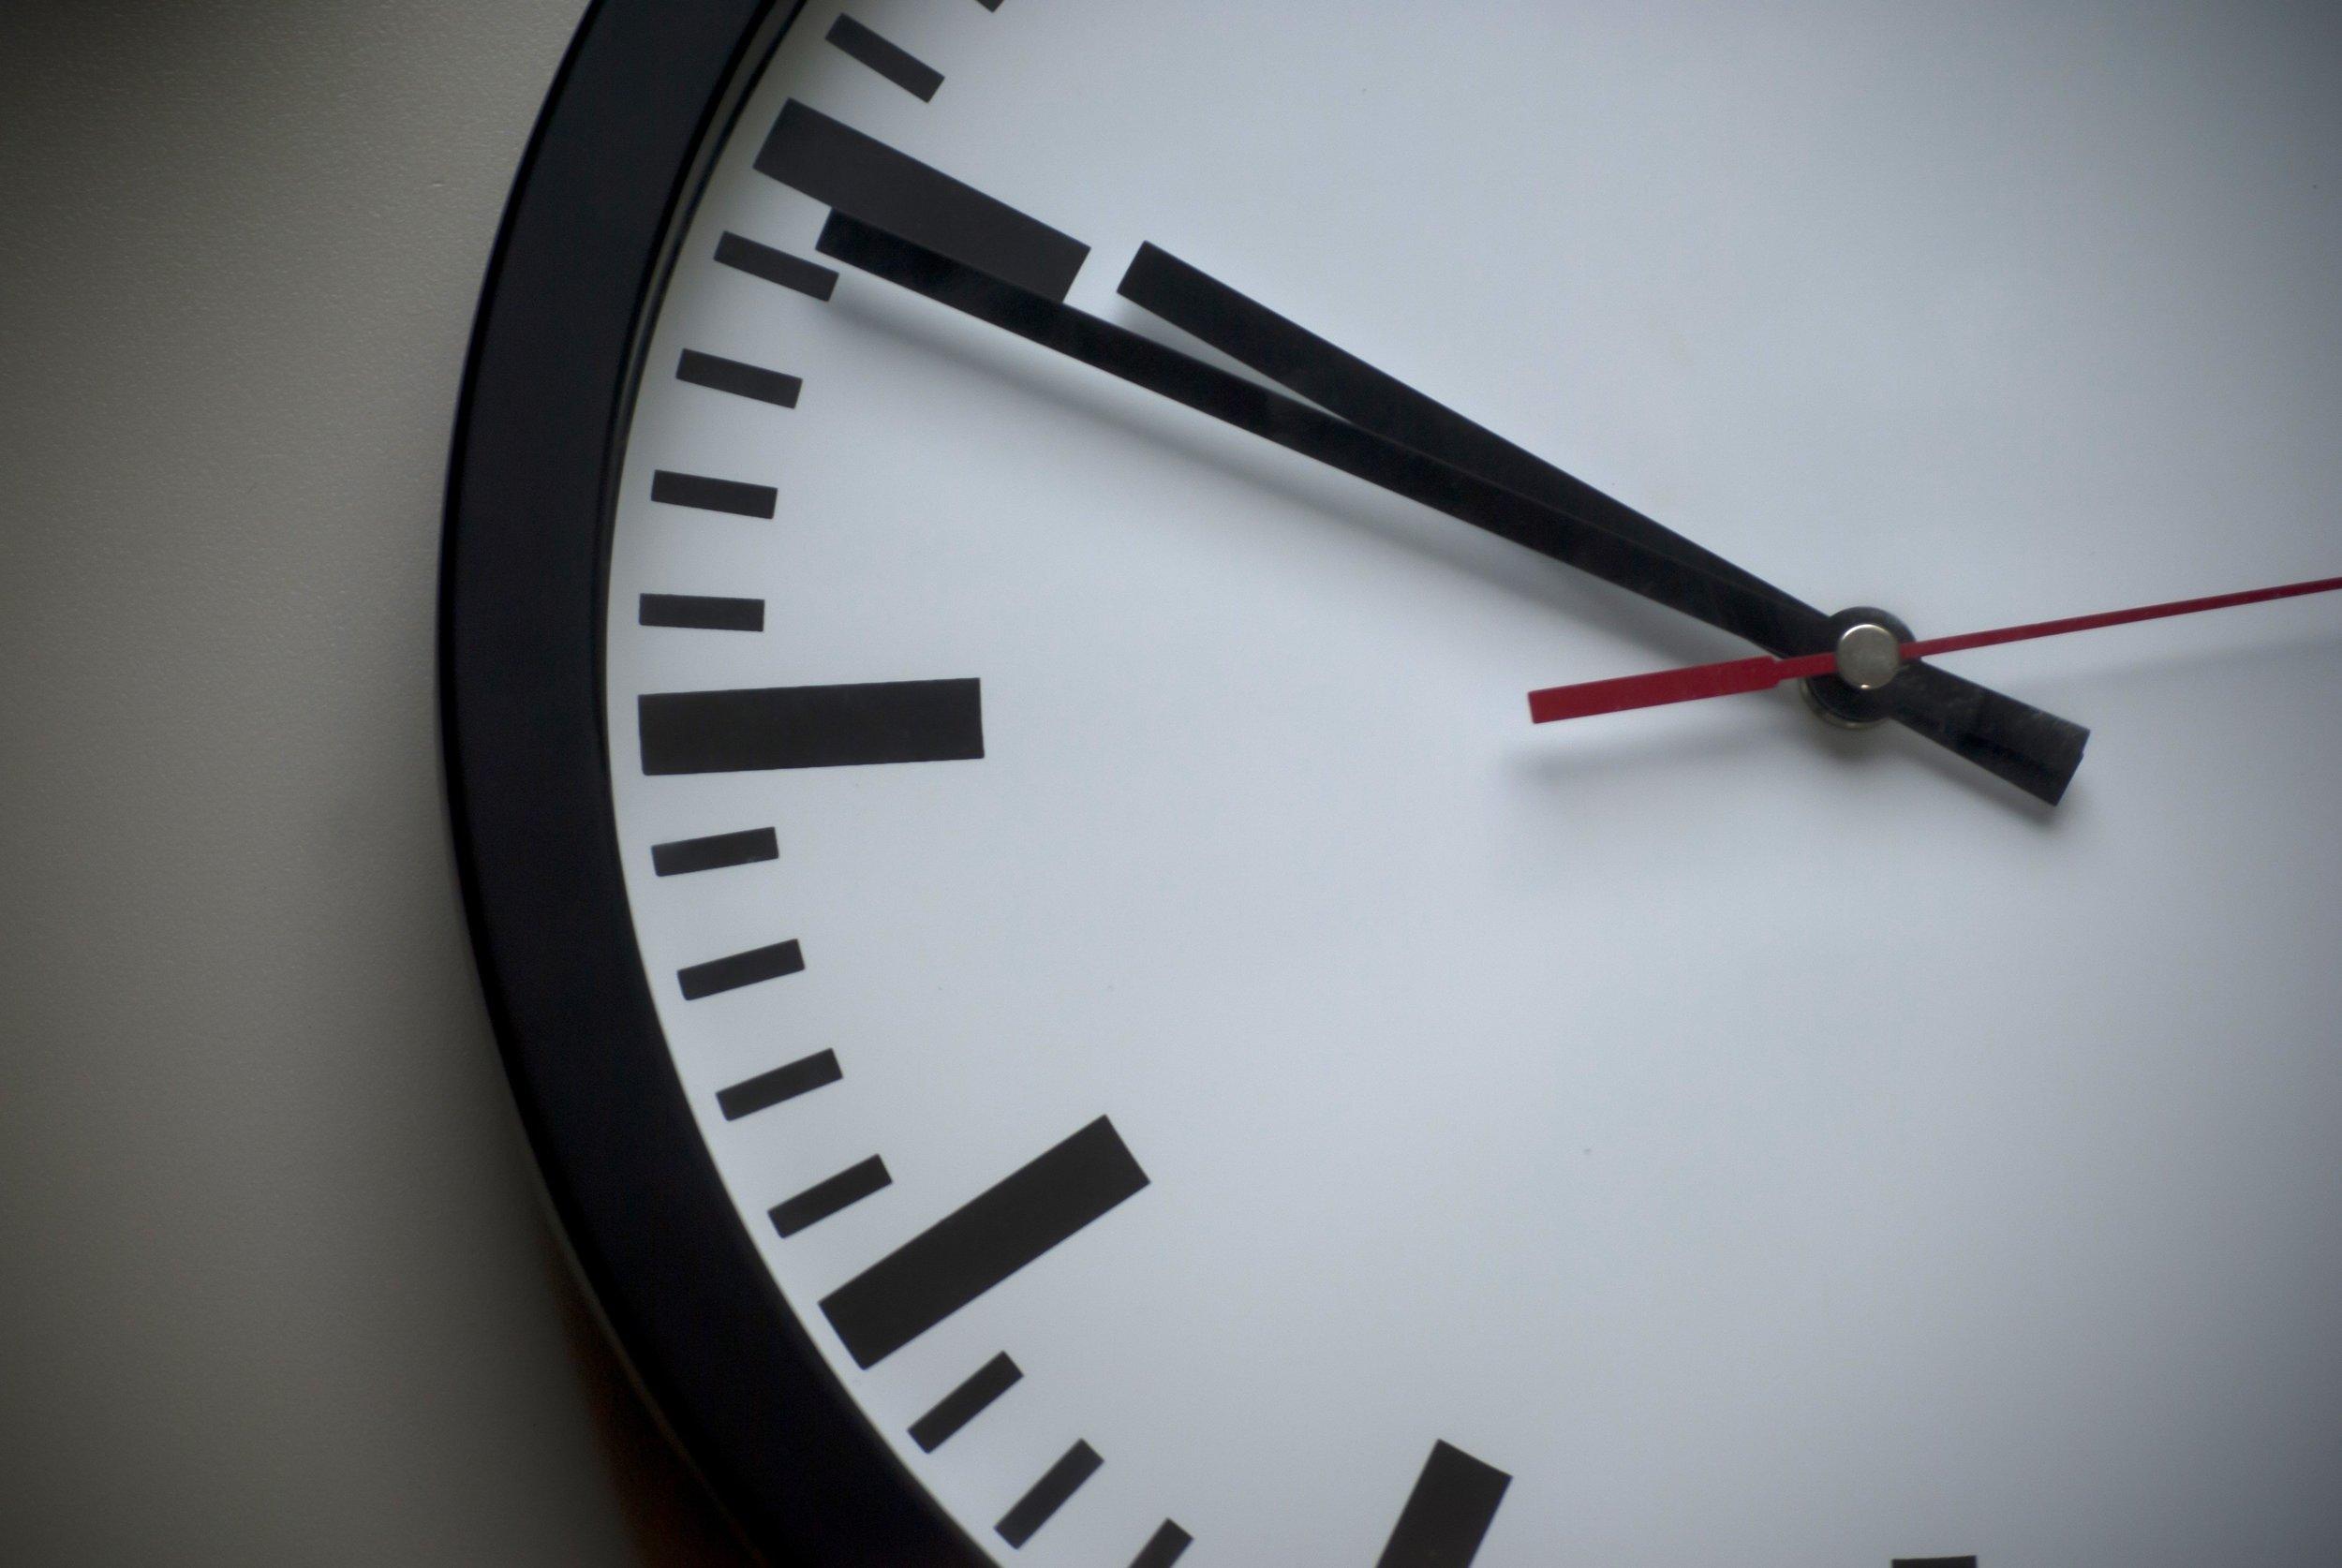 analogue-classic-clock-face-280264.jpg